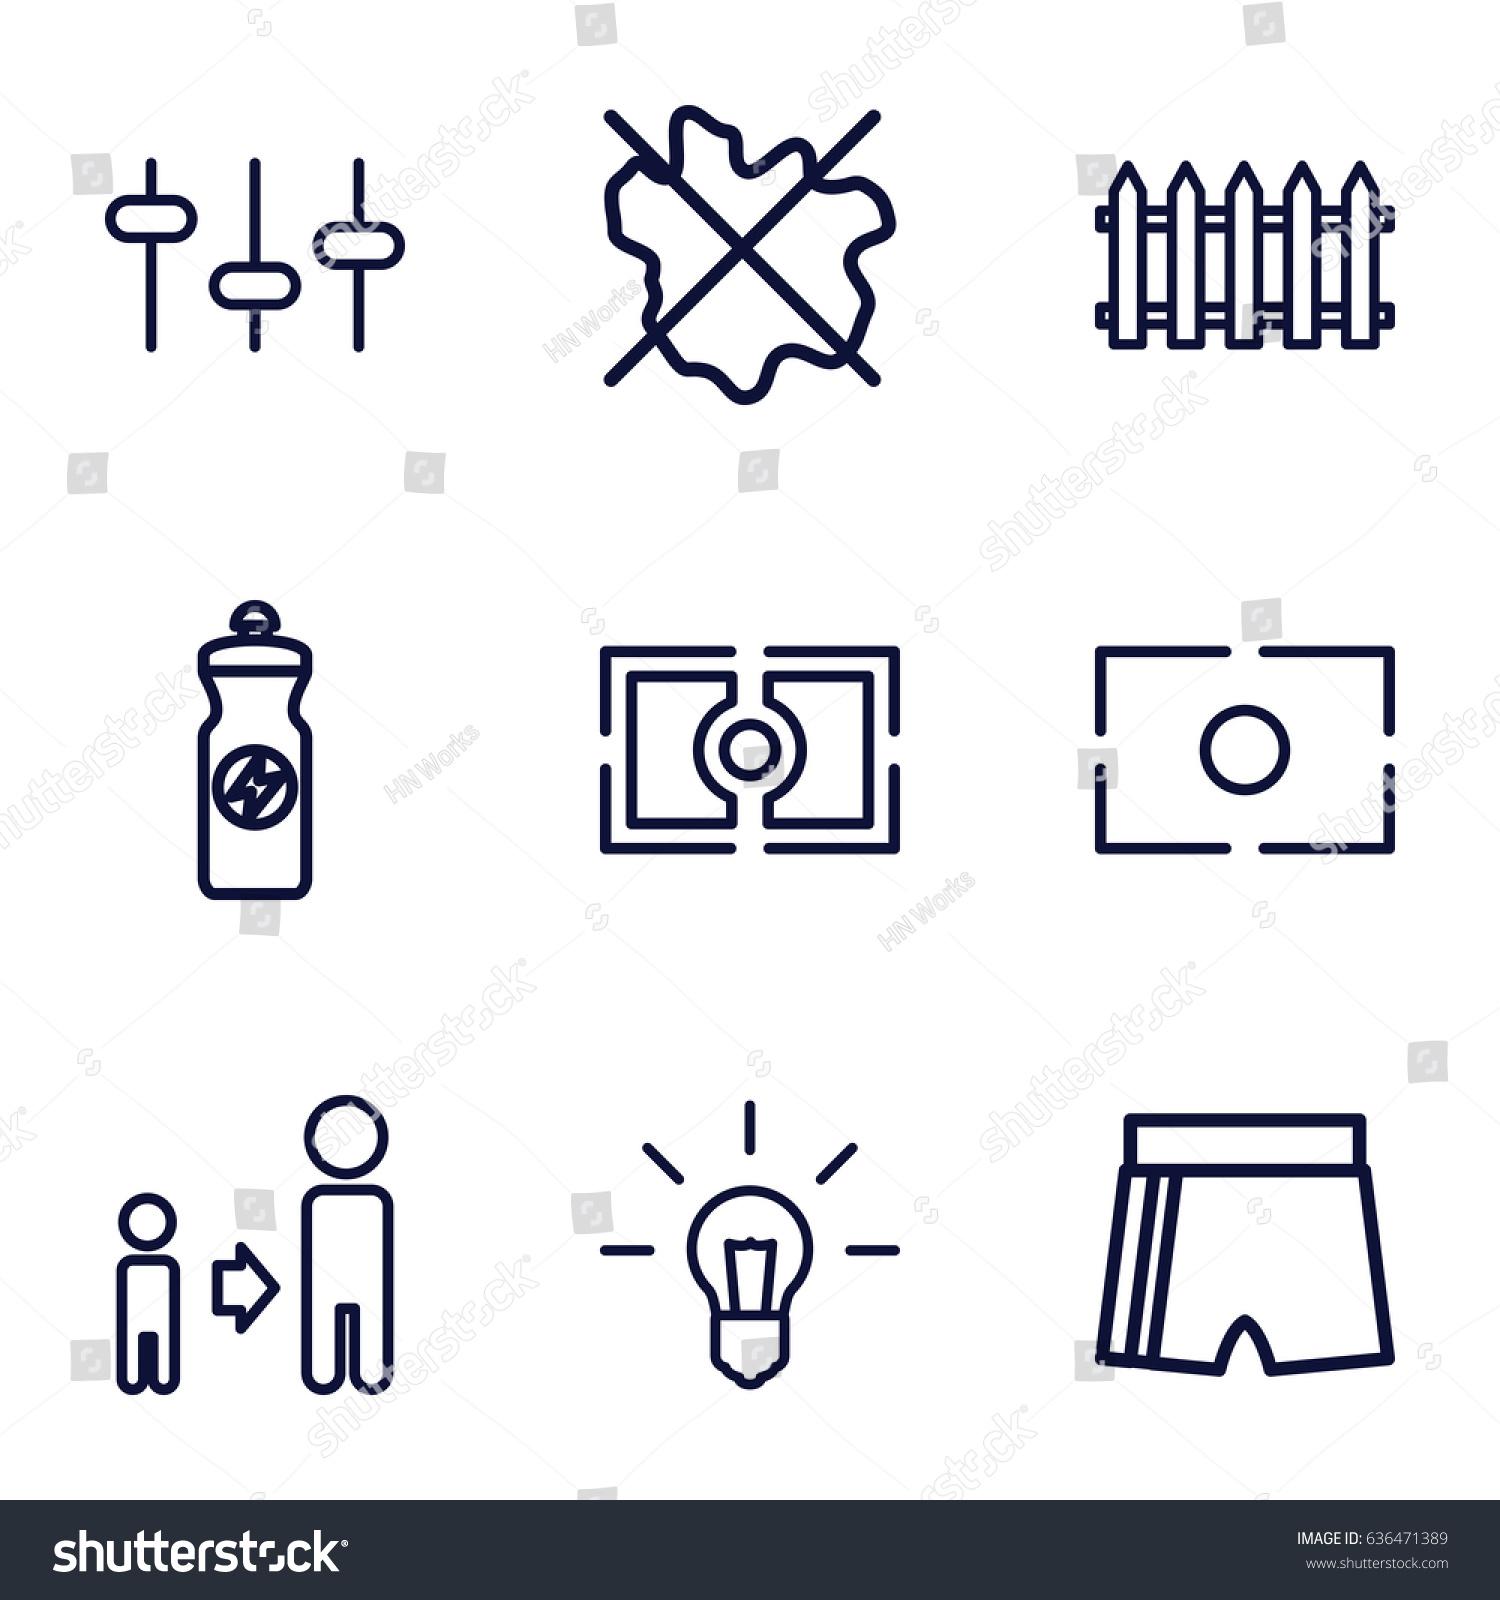 Creative icons set set 9 creative stock vector 636471389 creative icons set set of 9 creative outline icons such as fence no wash biocorpaavc